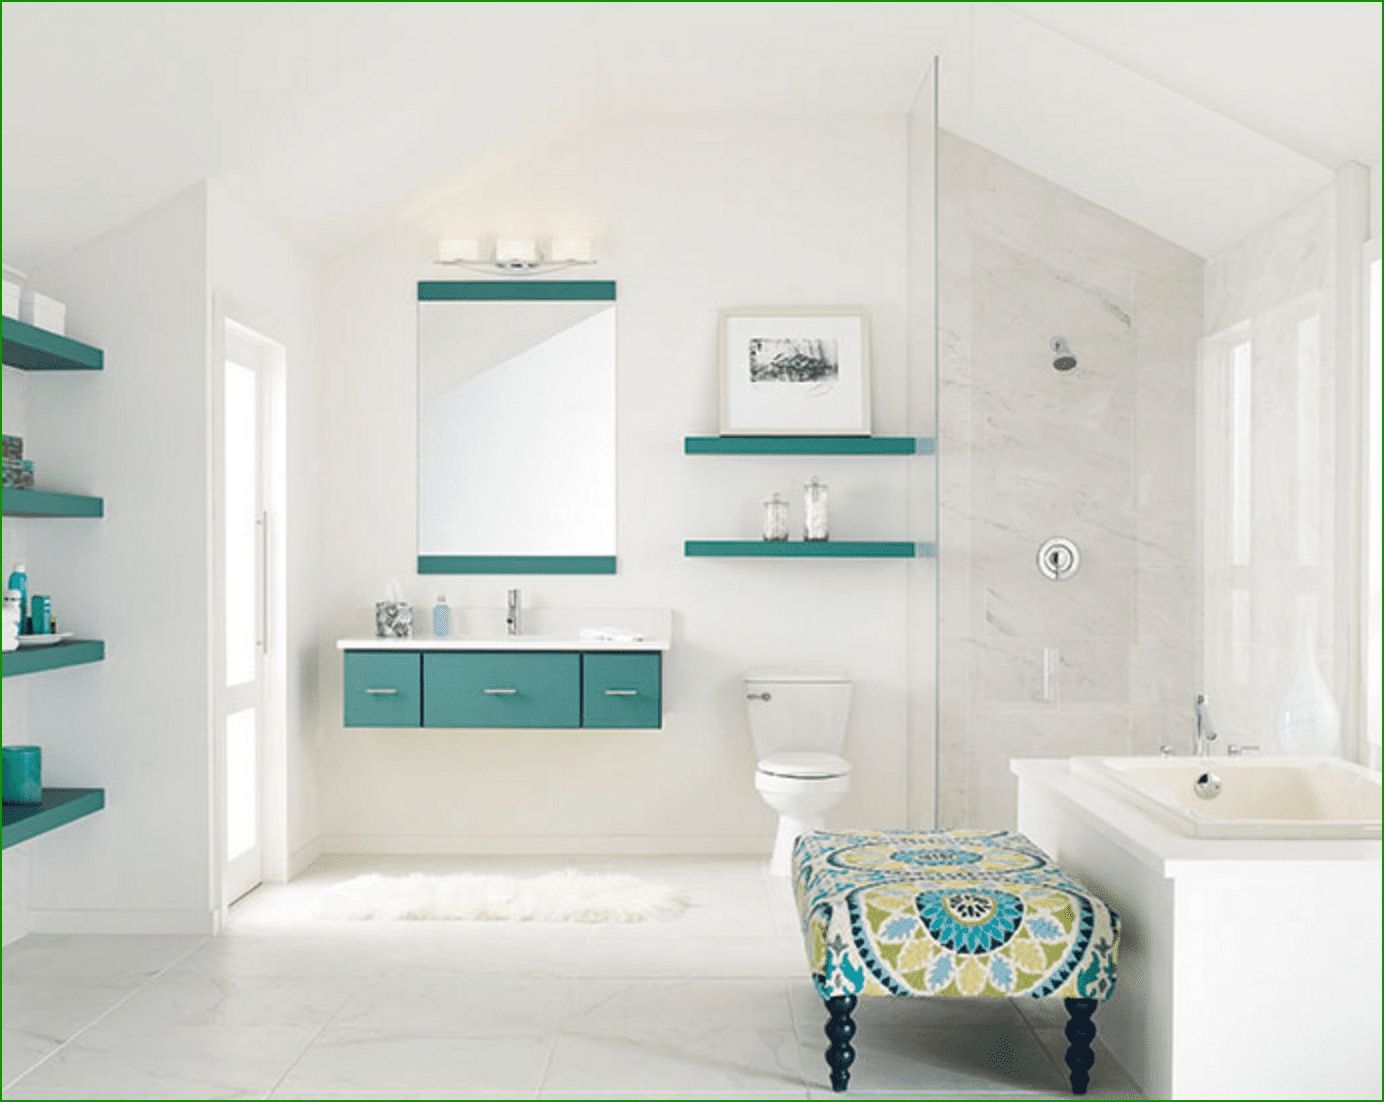 15 Secrets To Make Your Bathroom Look Expensive Teal Bathroom Accessories Stylish Bathroom Bathroom Colors [ 1102 x 1384 Pixel ]